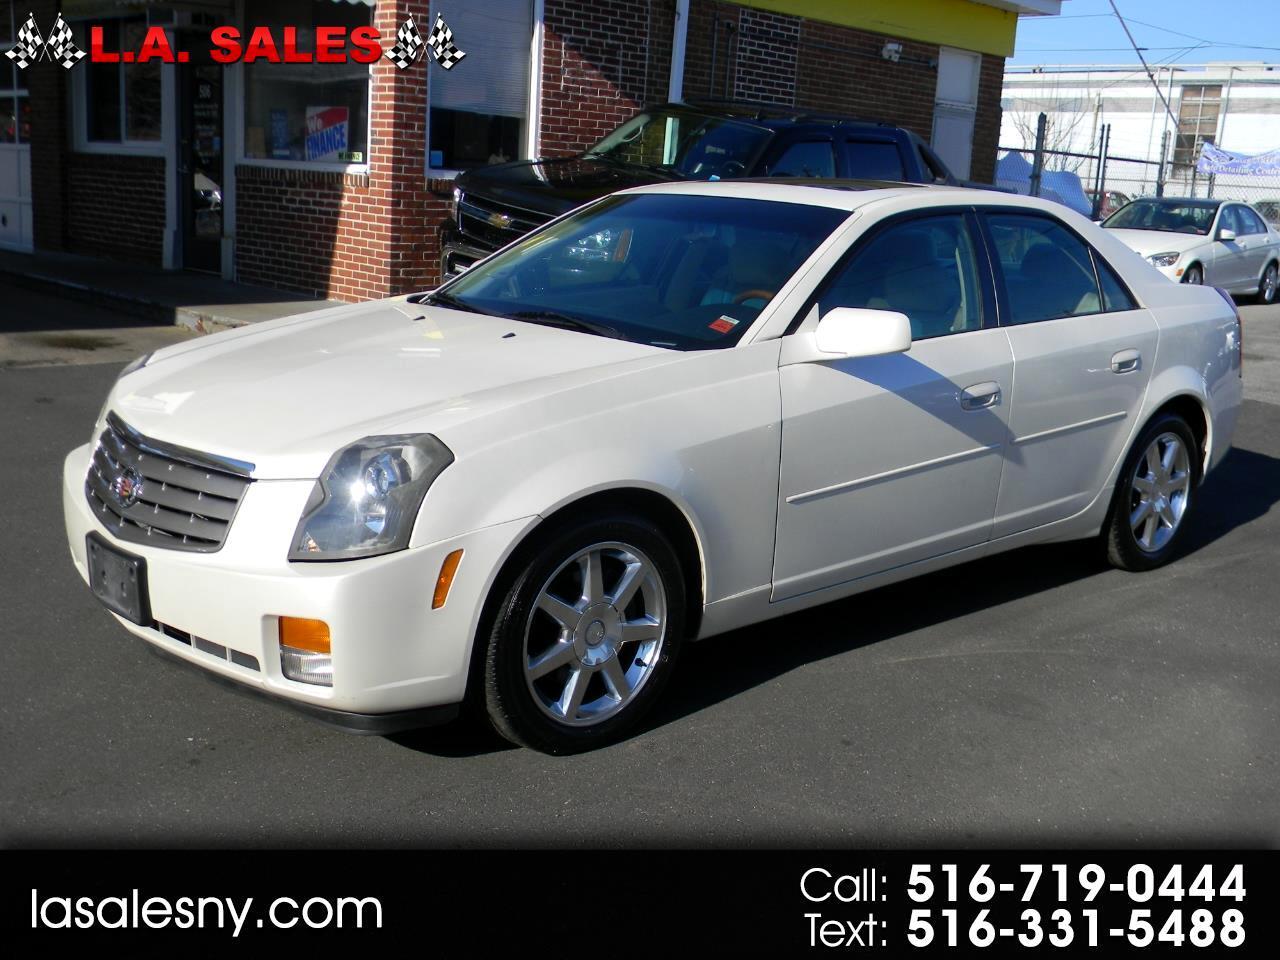 Cadillac CTS 4dr Sdn 3.6L 2005